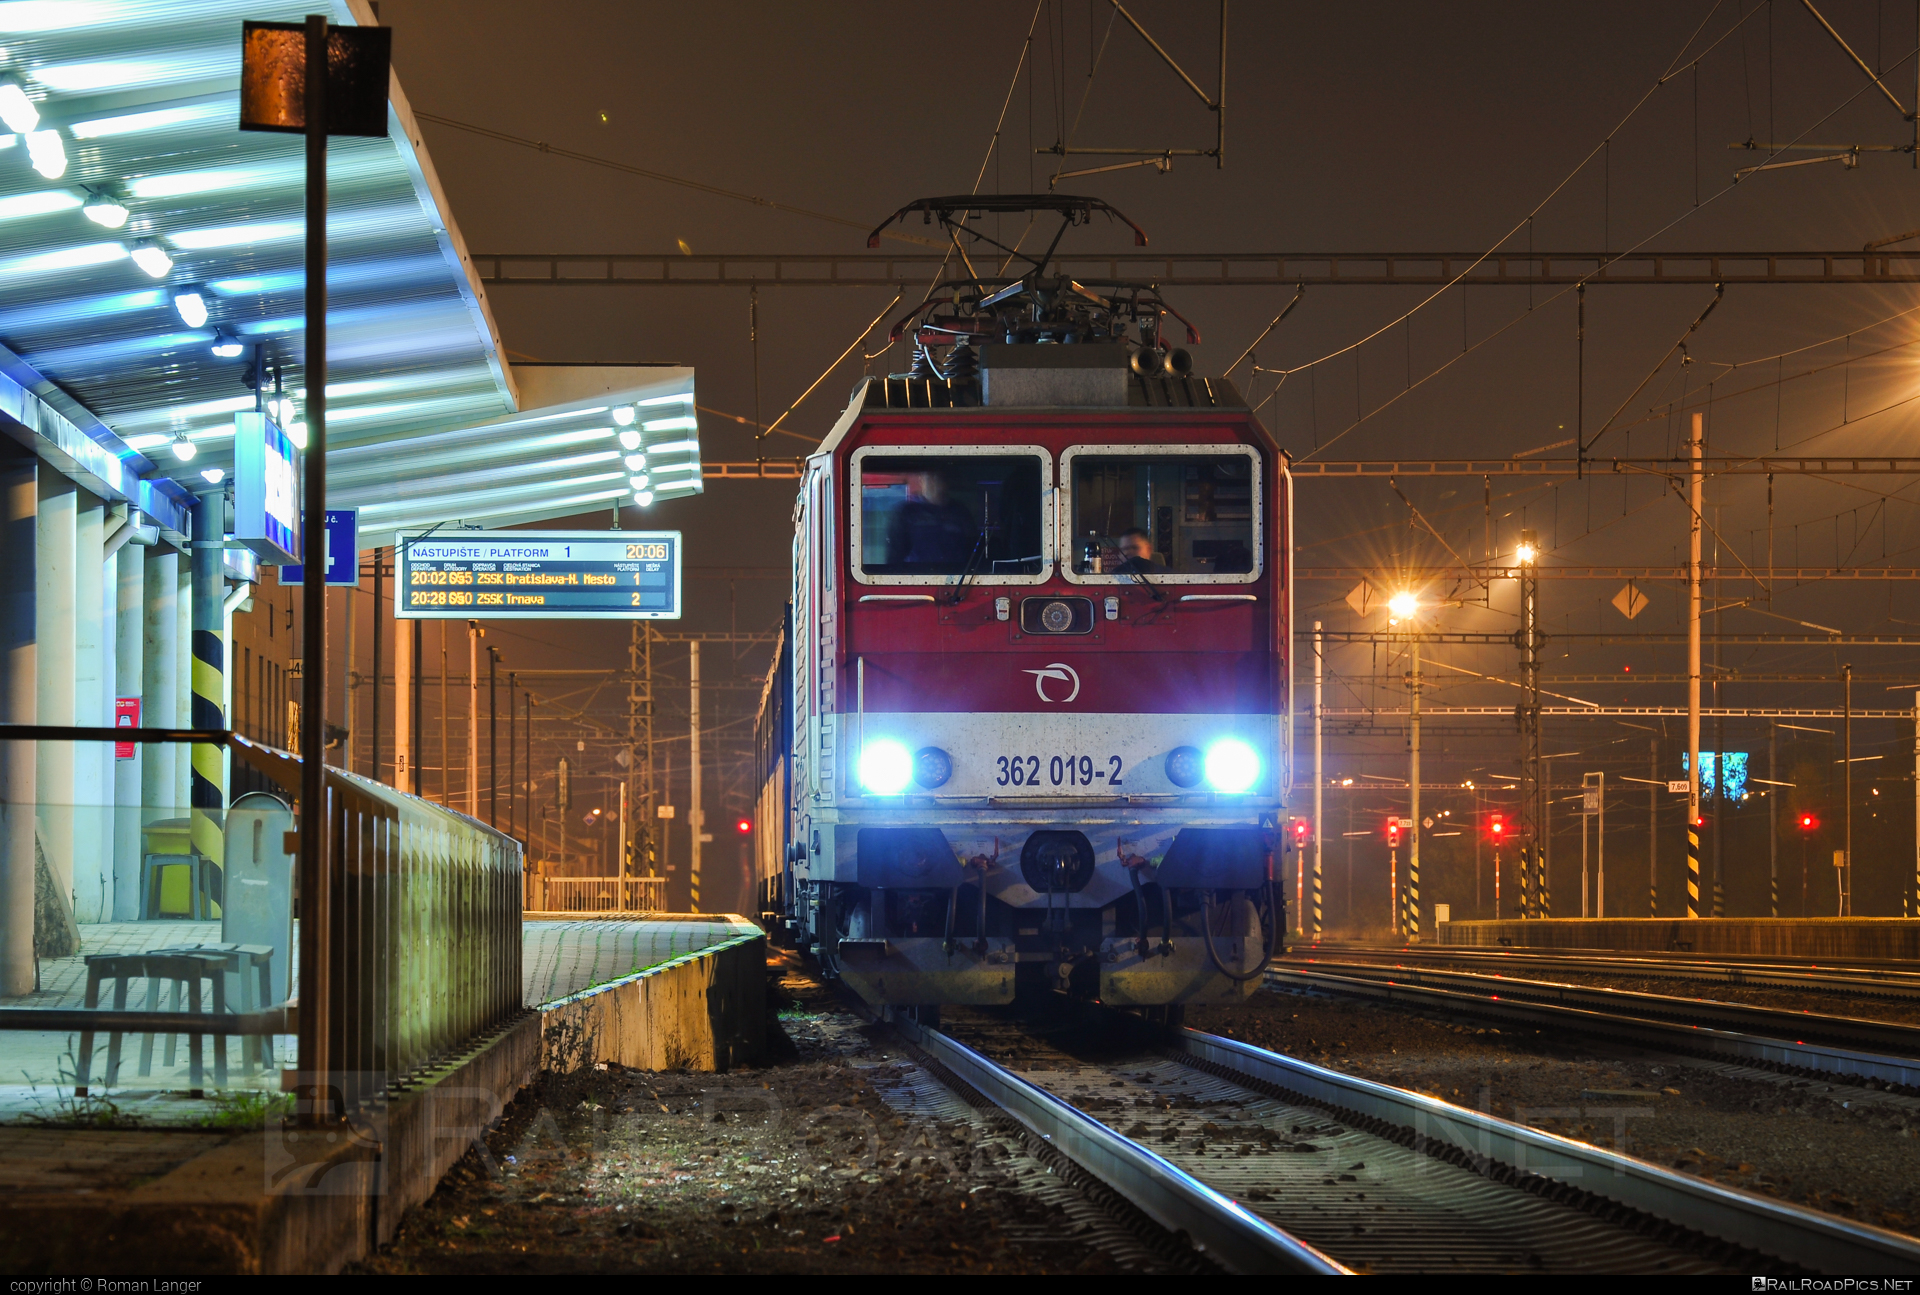 Škoda 69Er - 362 019-2 operated by Železničná Spoločnost' Slovensko, a.s. #ZeleznicnaSpolocnostSlovensko #eso #locomotive362 #rychleeso #skoda #skoda69er #zssk